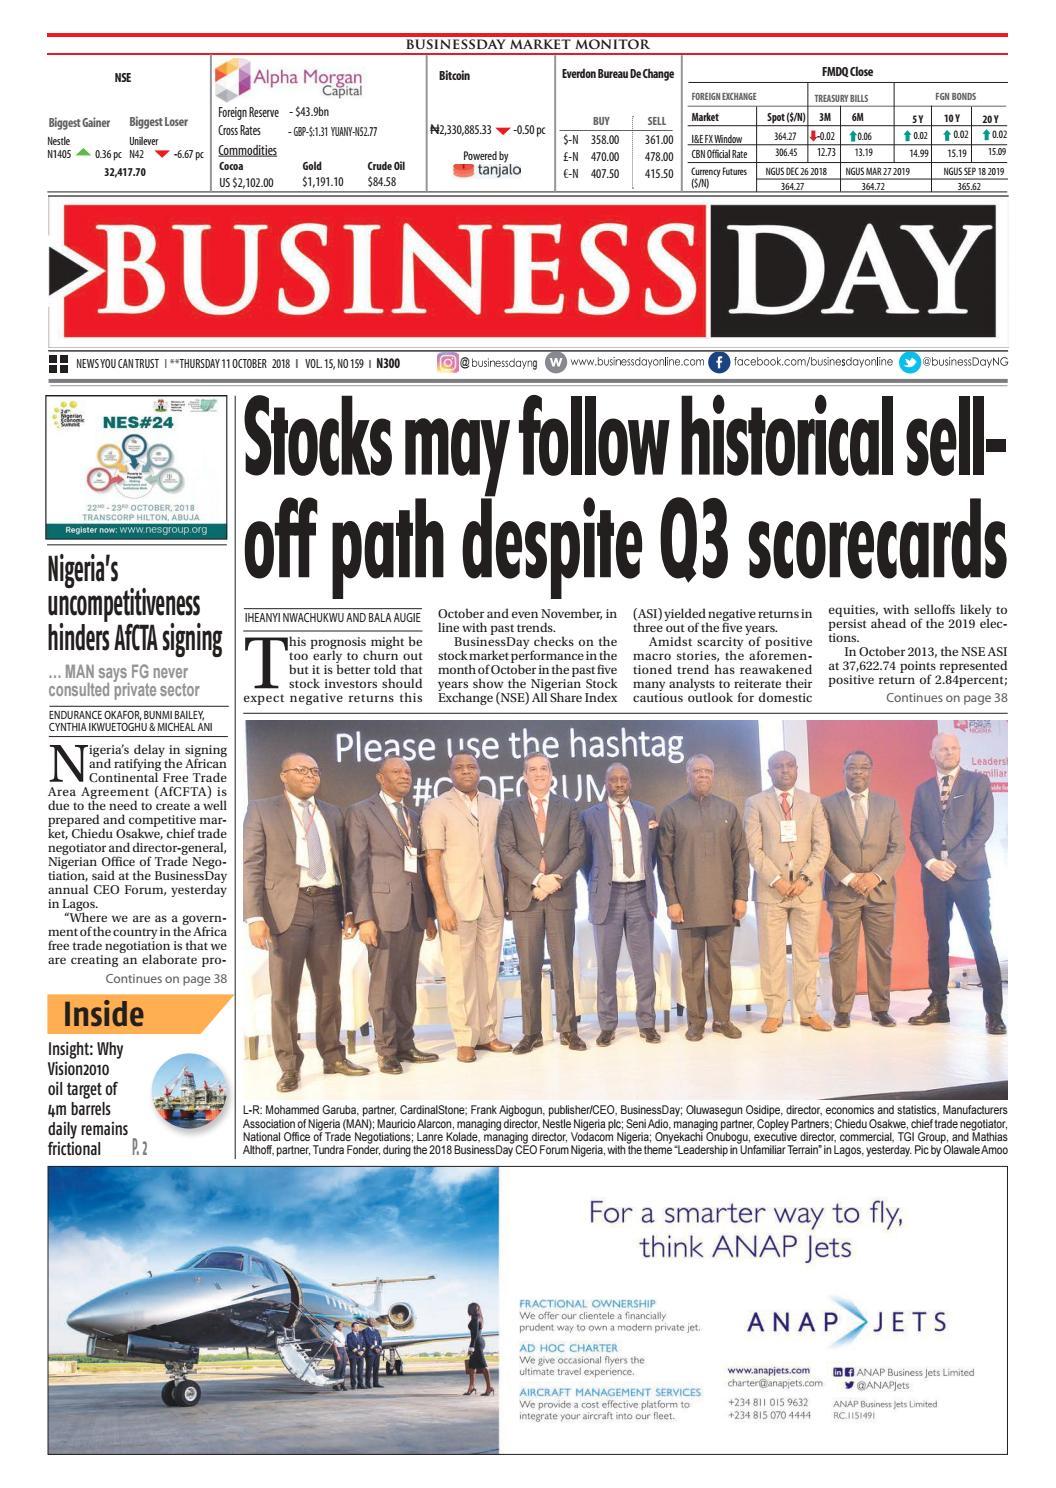 BusinessDay 11 Oct 2018 by BusinessDay - issuu